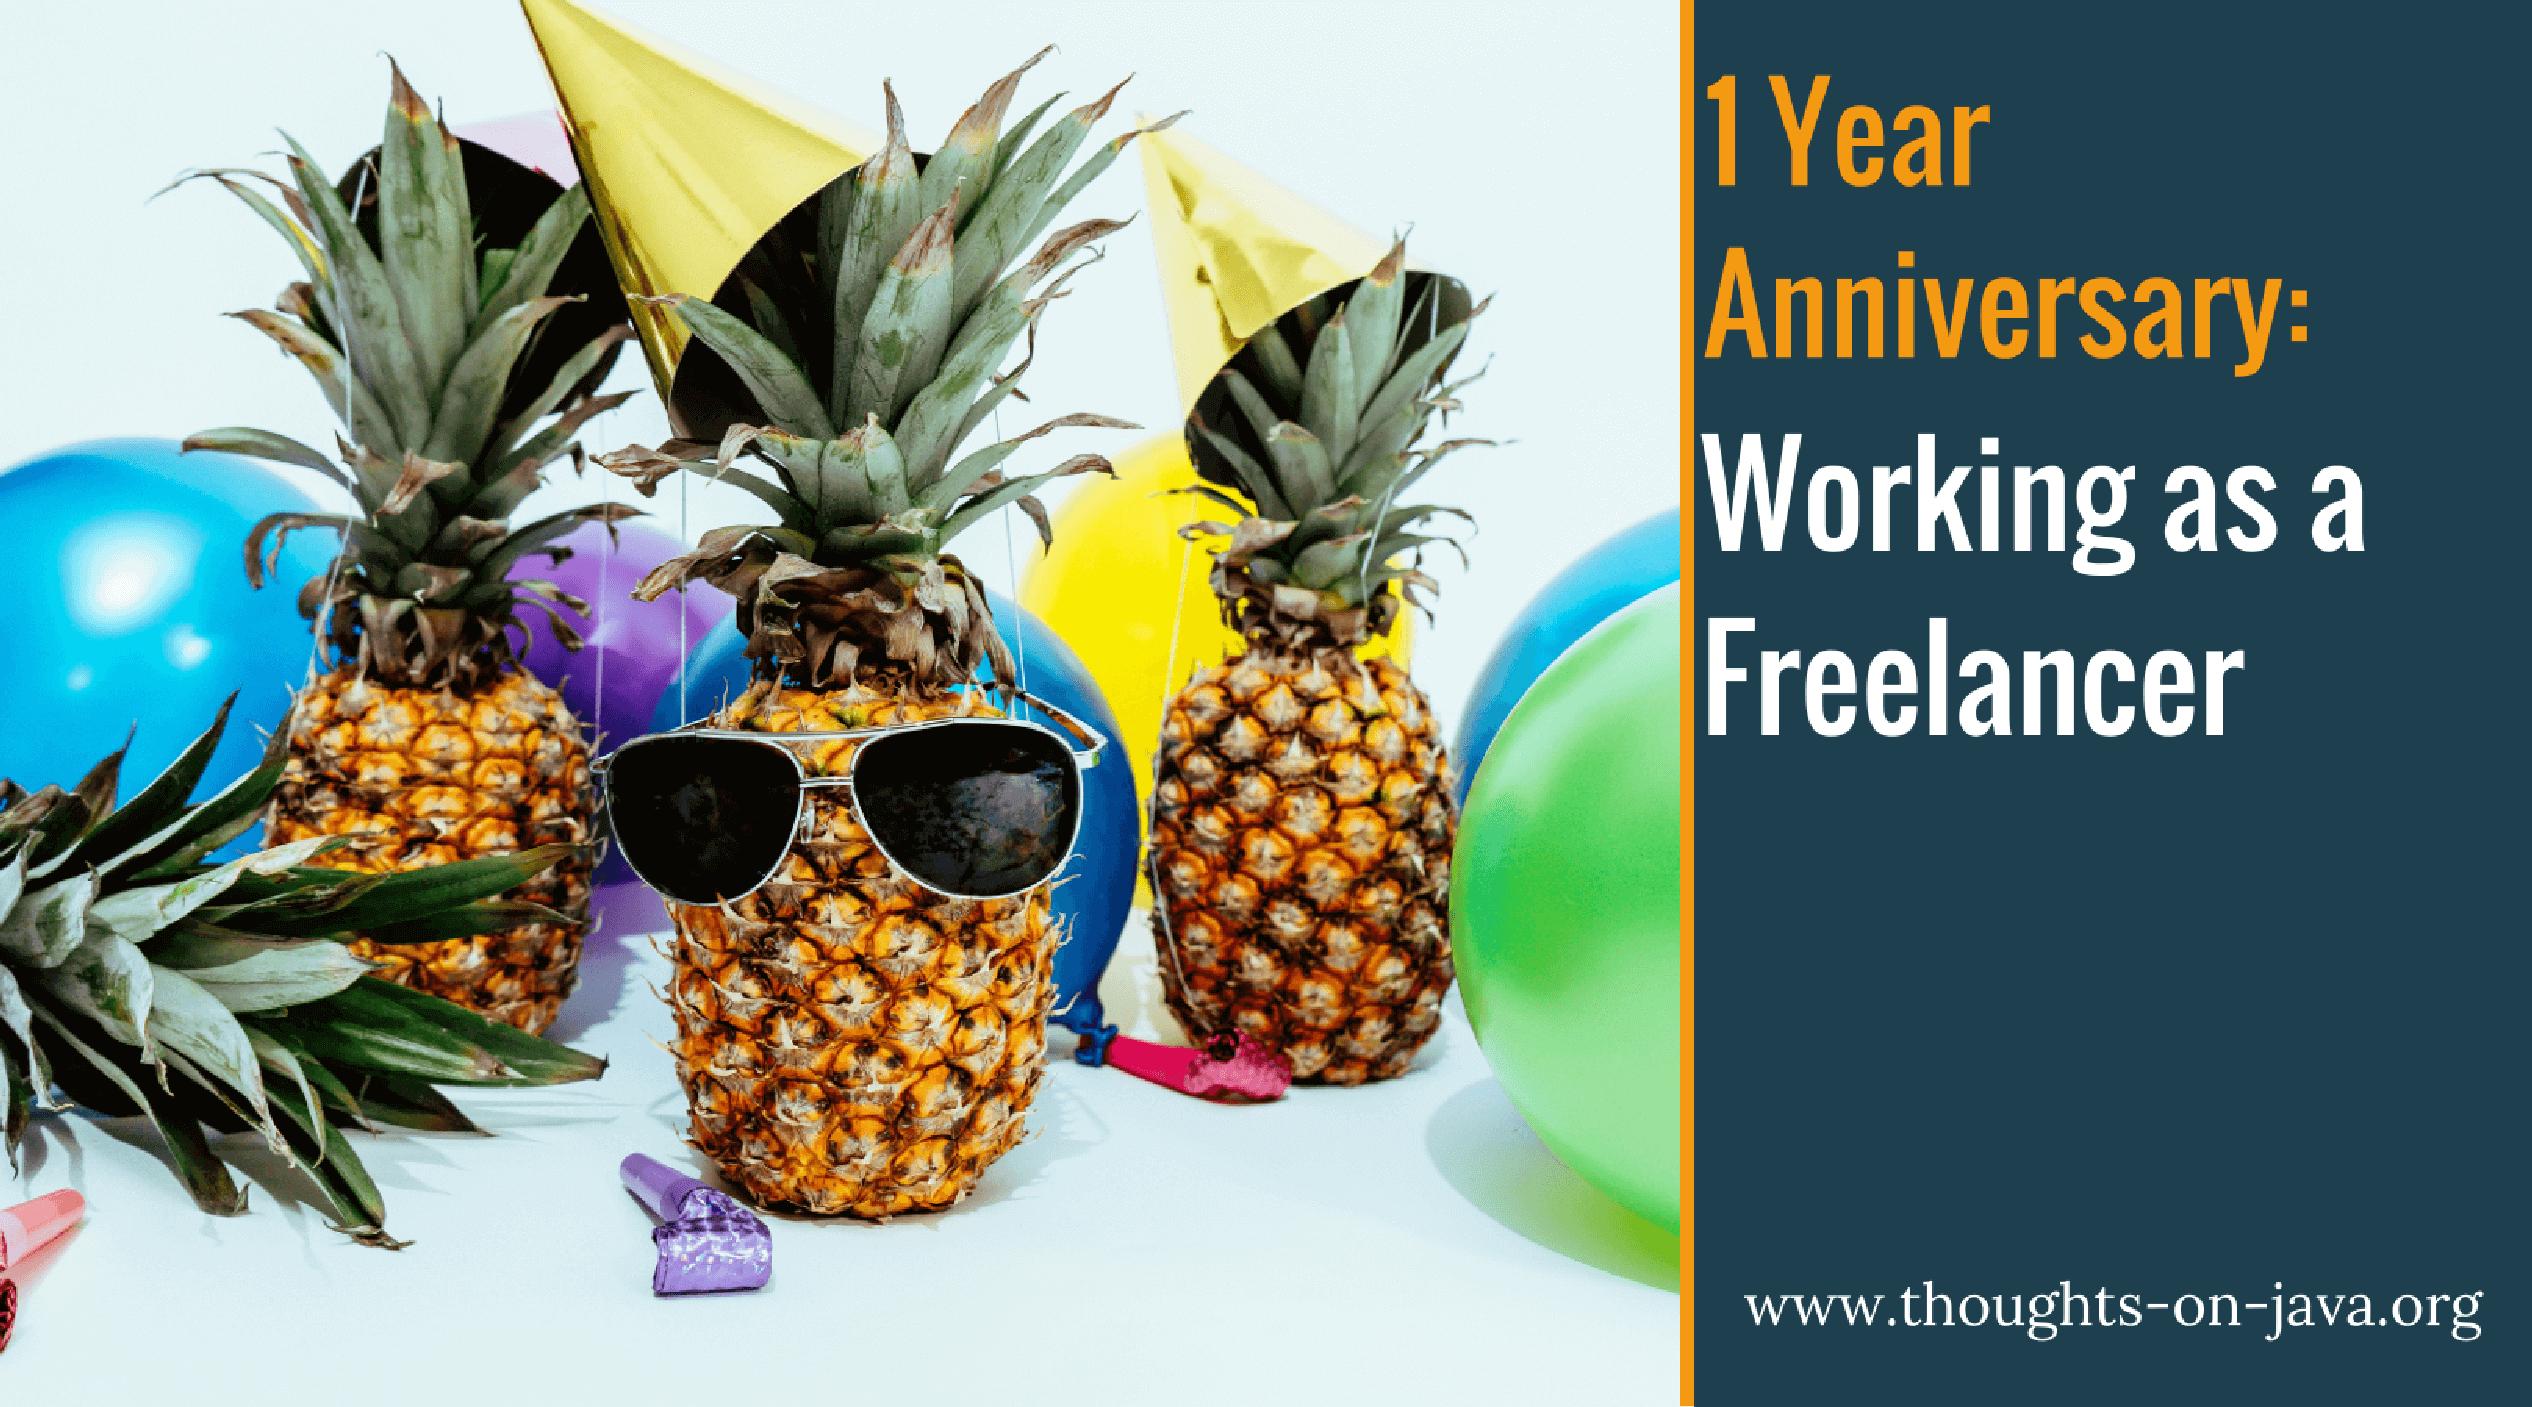 i work as a freelancer